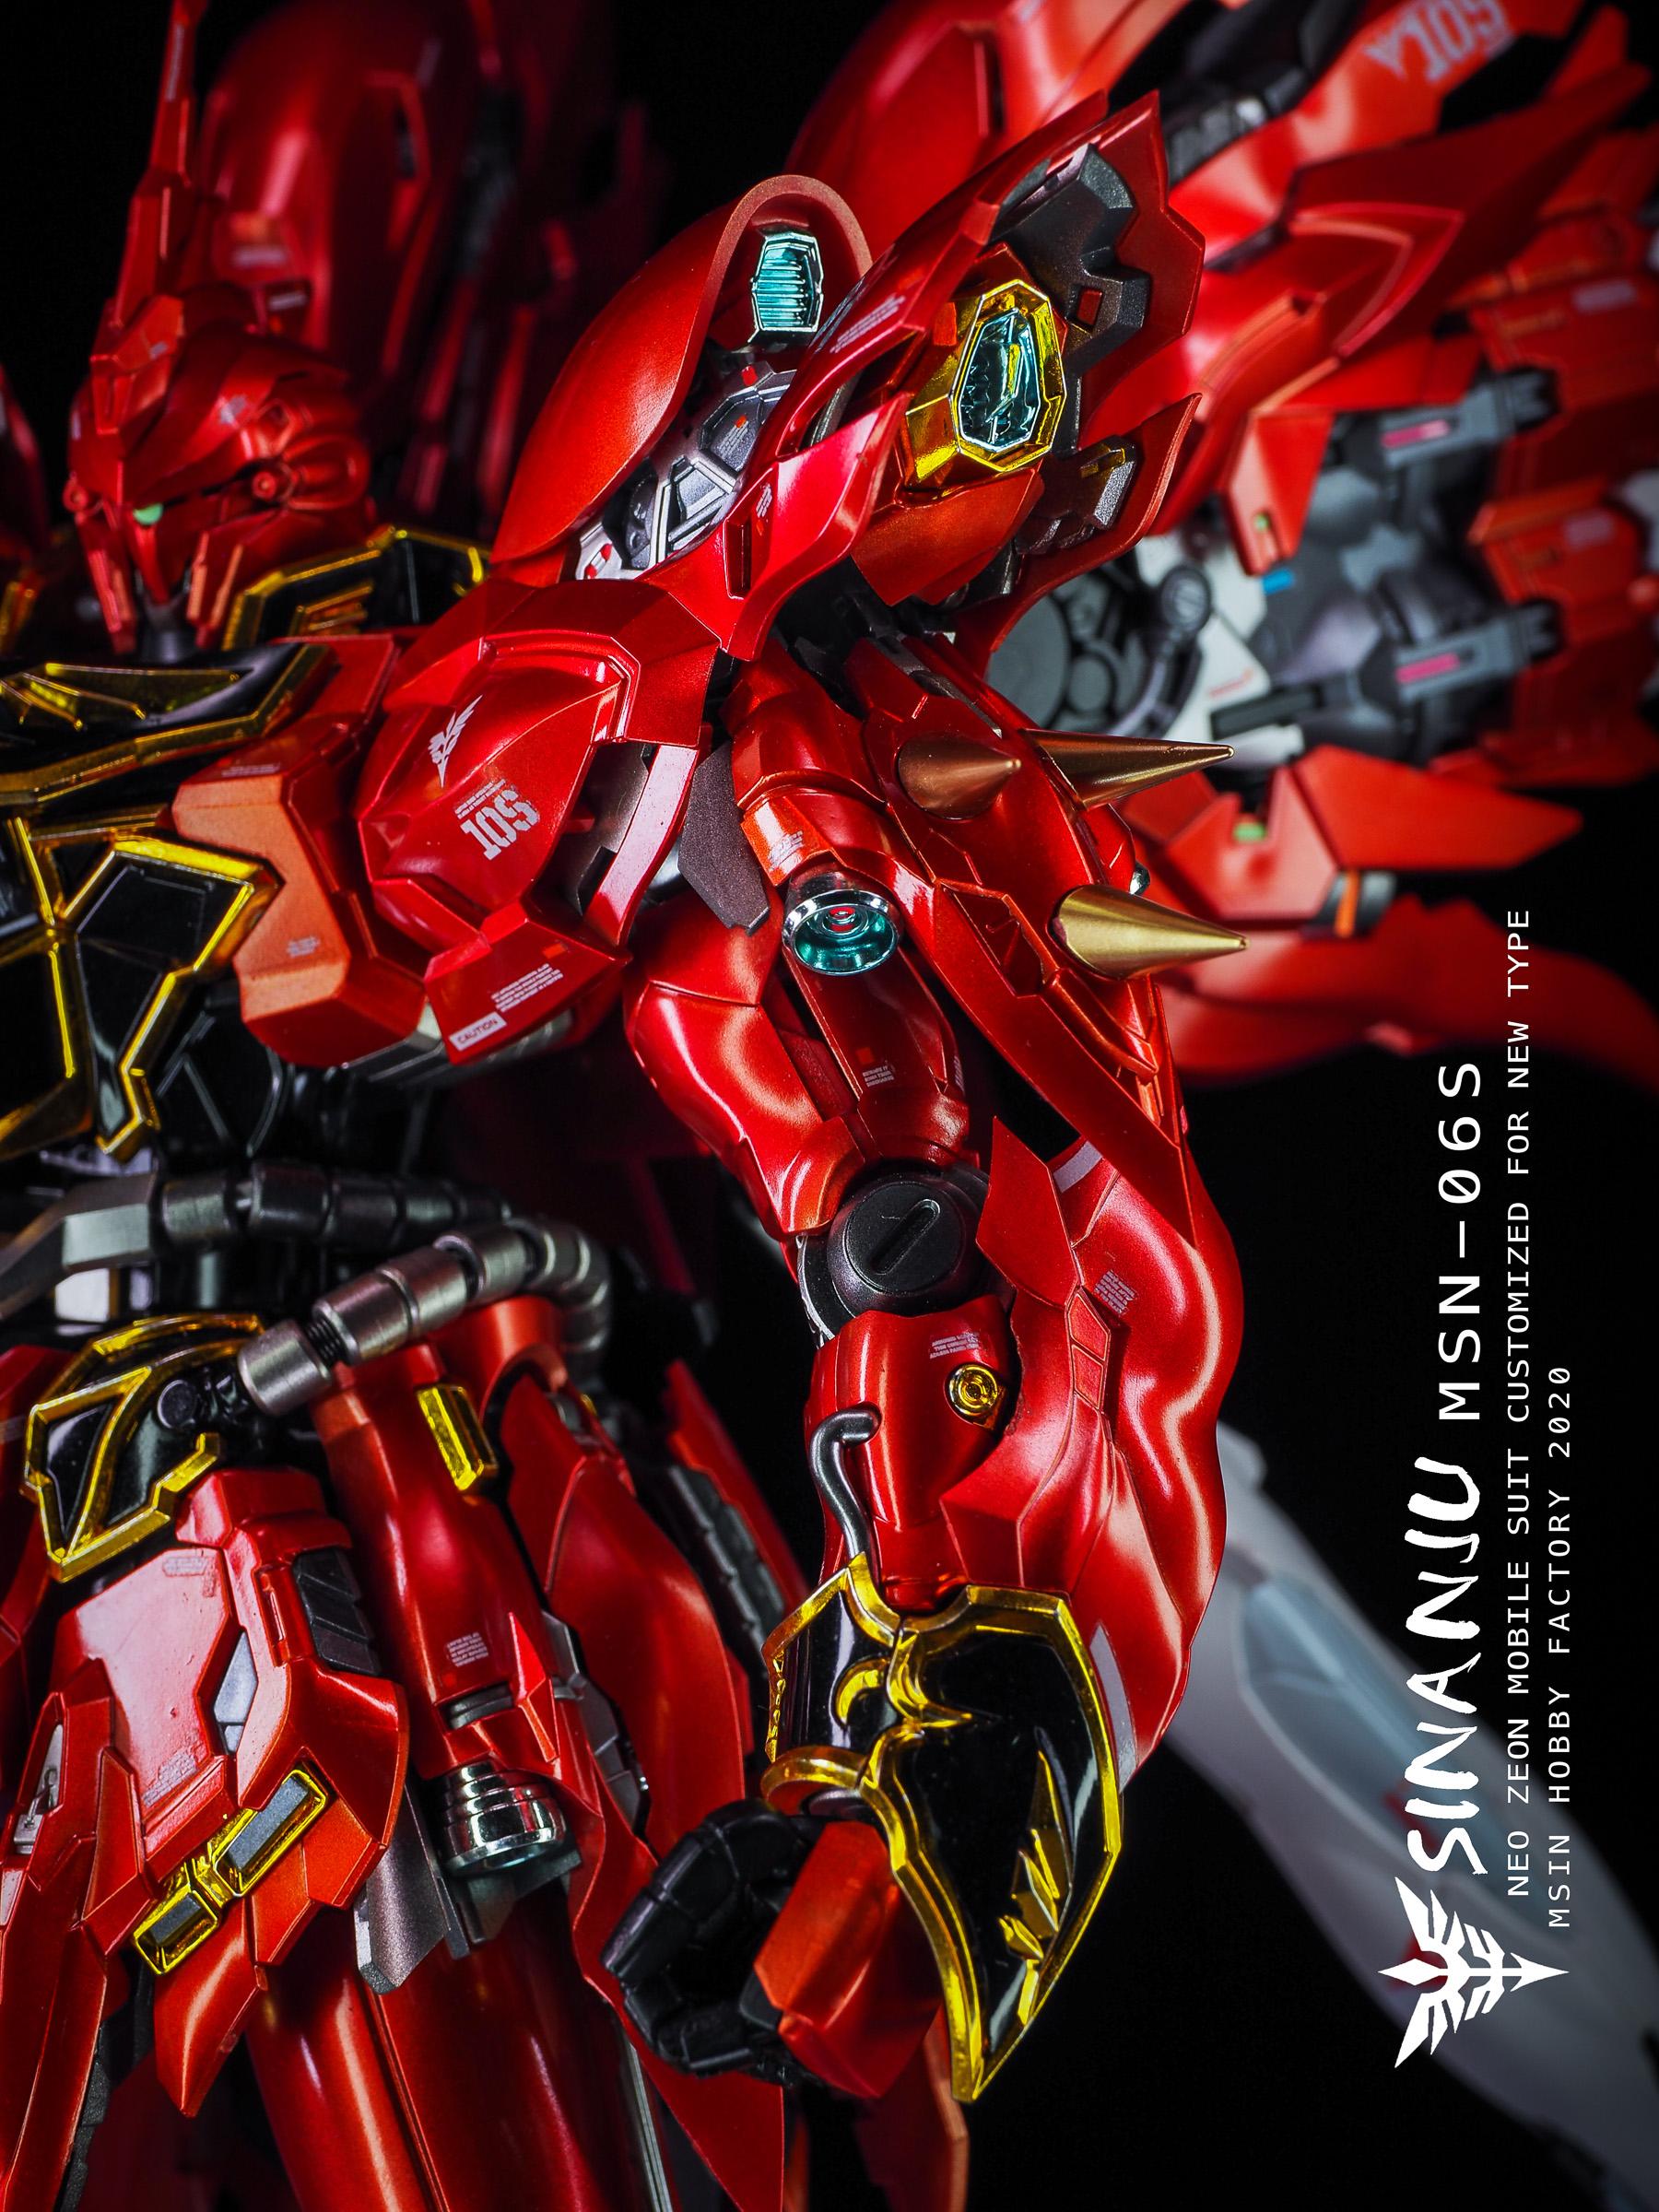 S437_6_takumi_sinanju_red_007.jpg